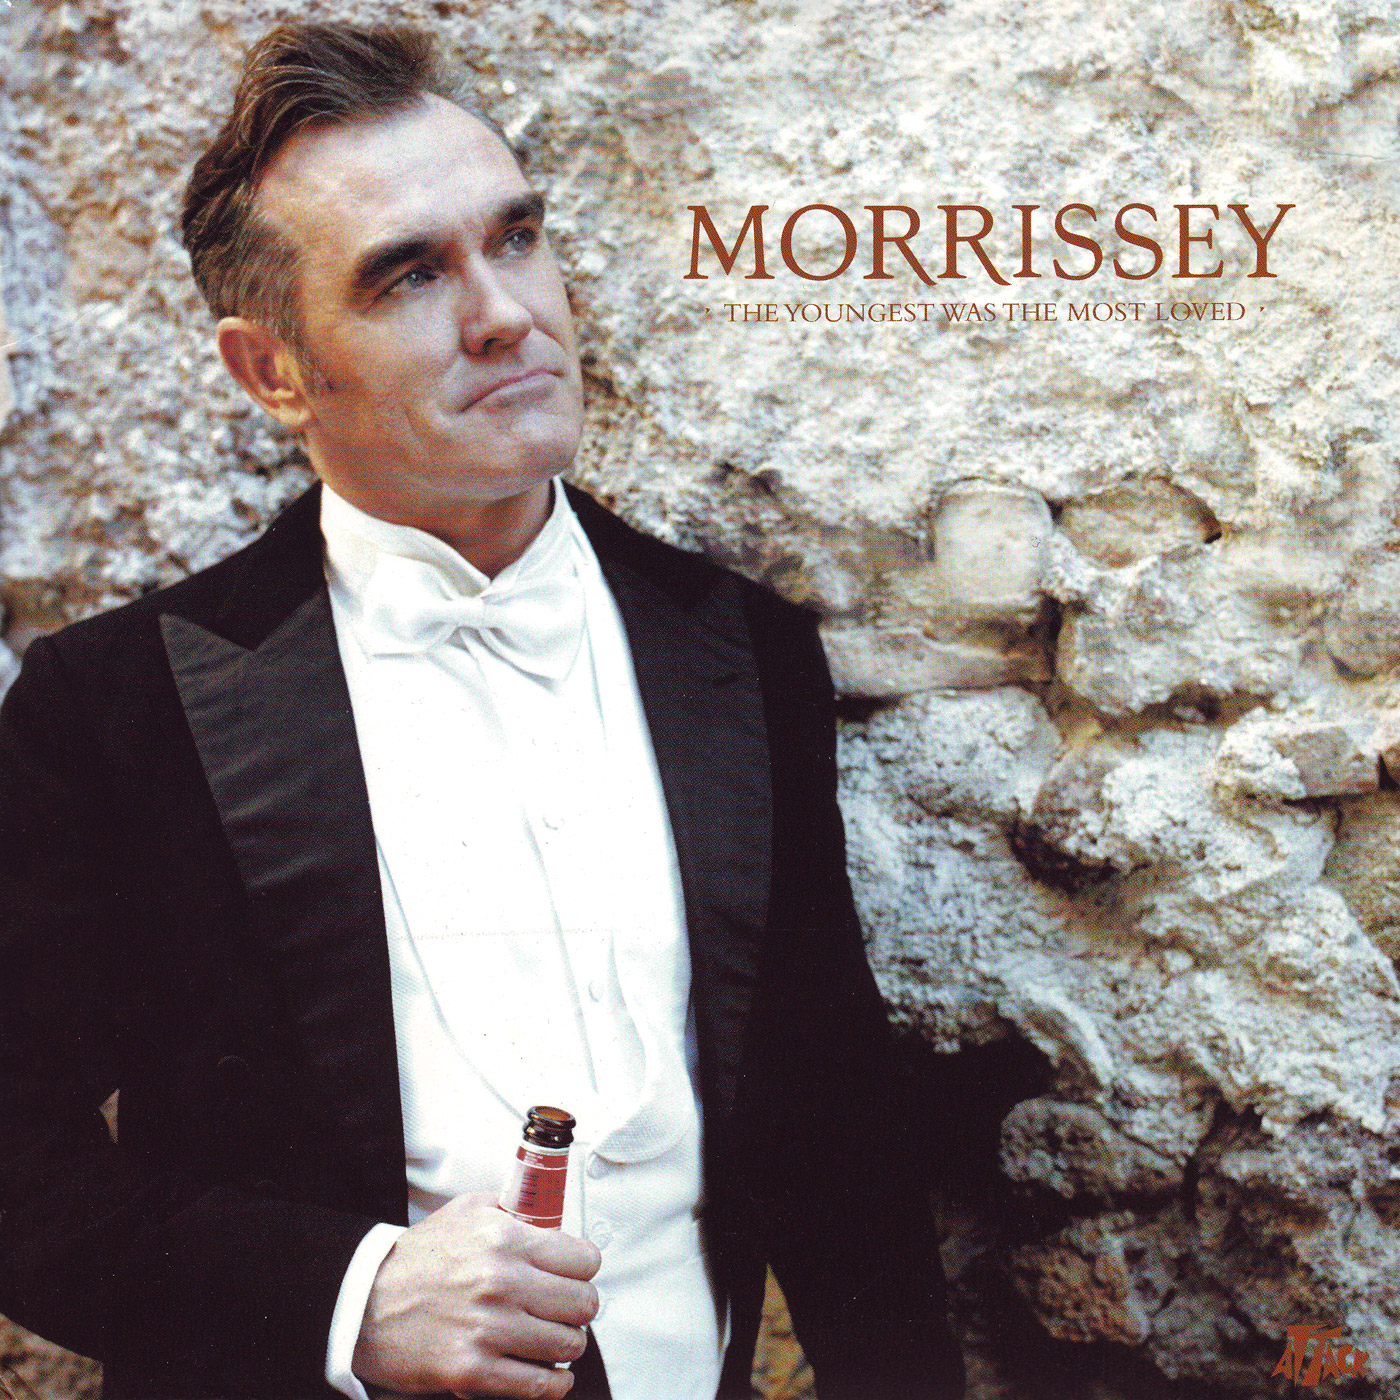 Morrissey Fabio Lovino tux booze.jpg